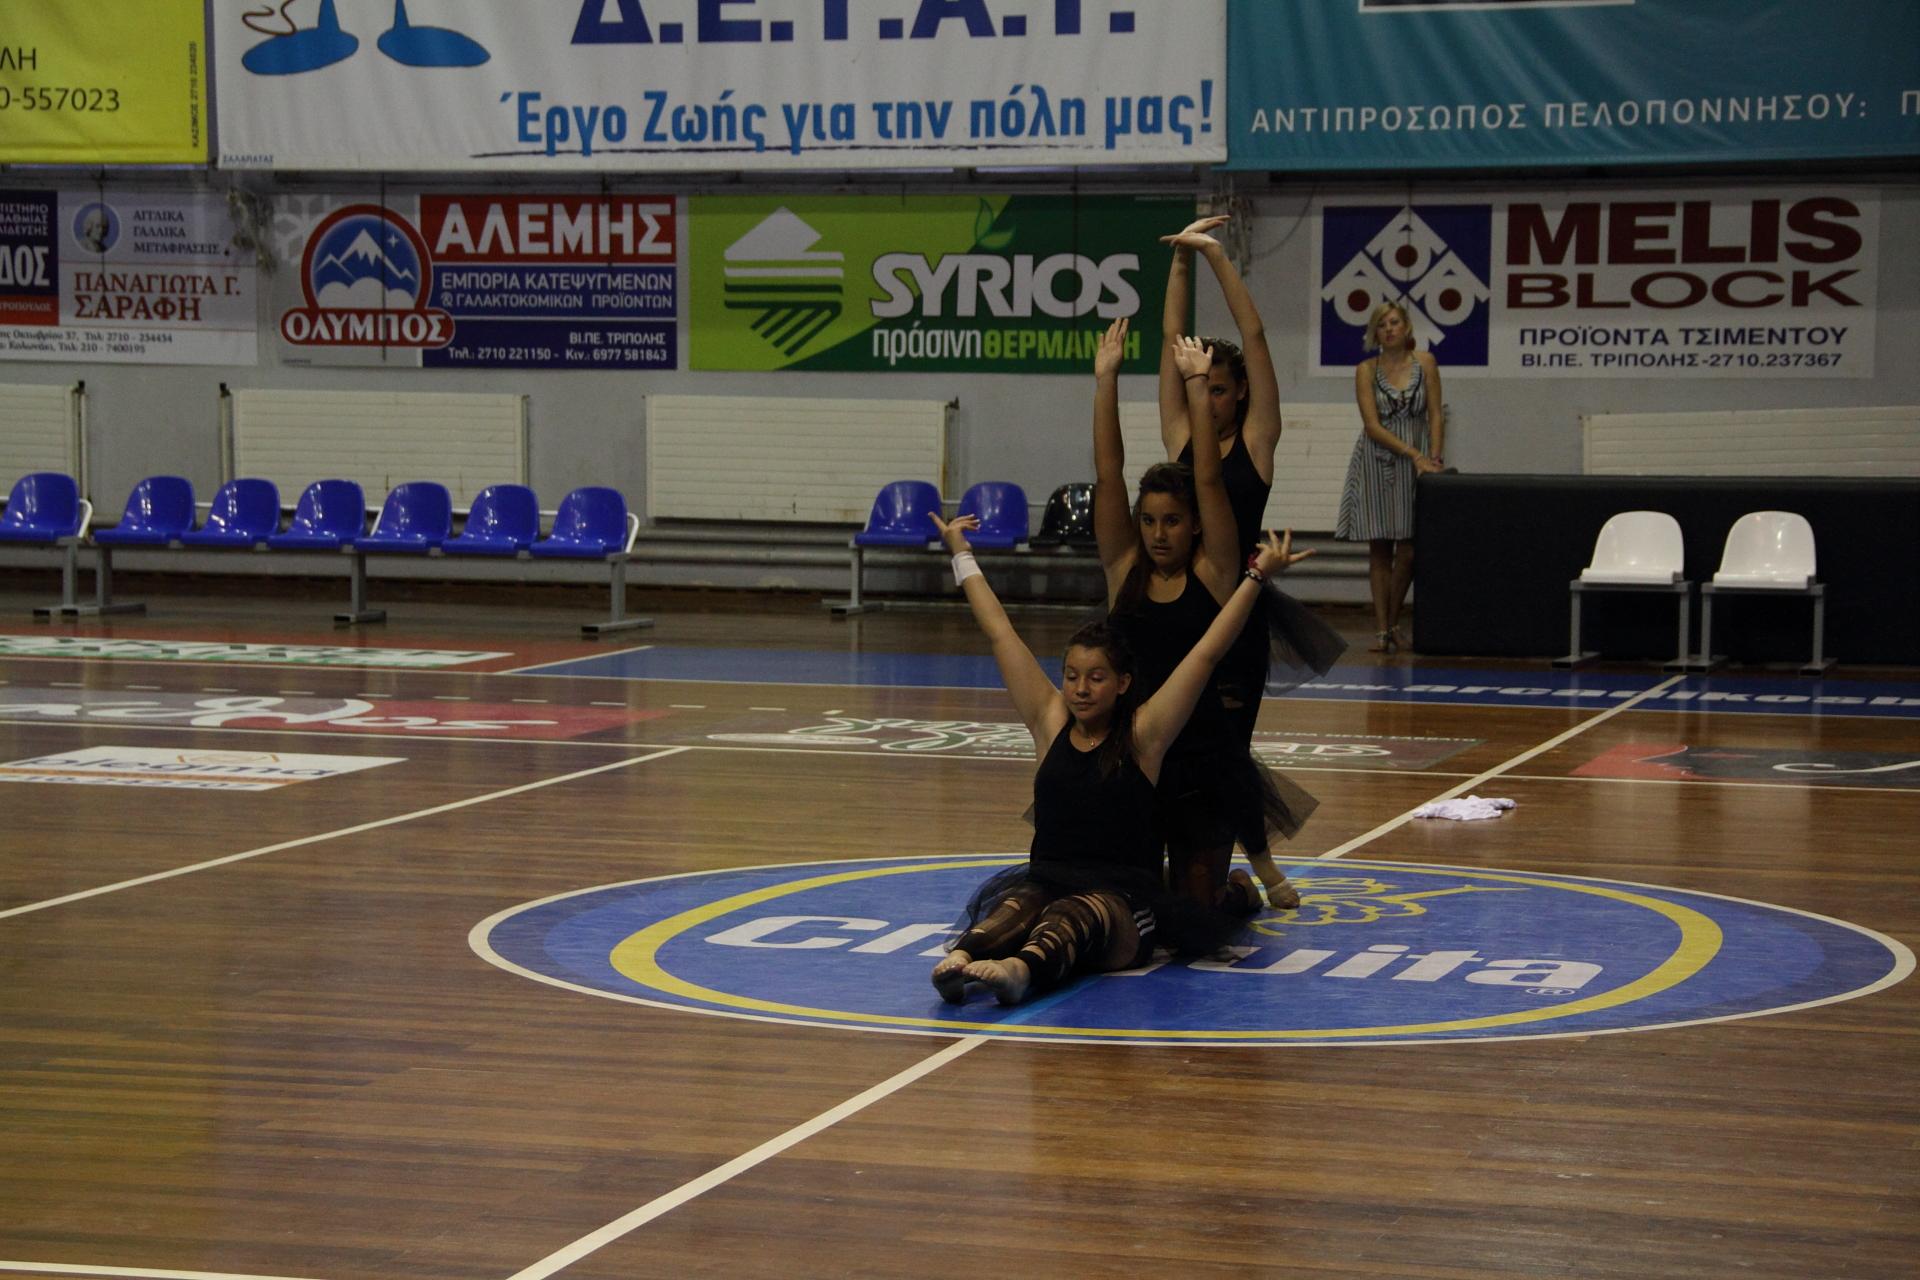 3o Τμήμα Modern Dance 4η Παράσταση Γυμναστηρίου »Top Gym»- »3 girls»